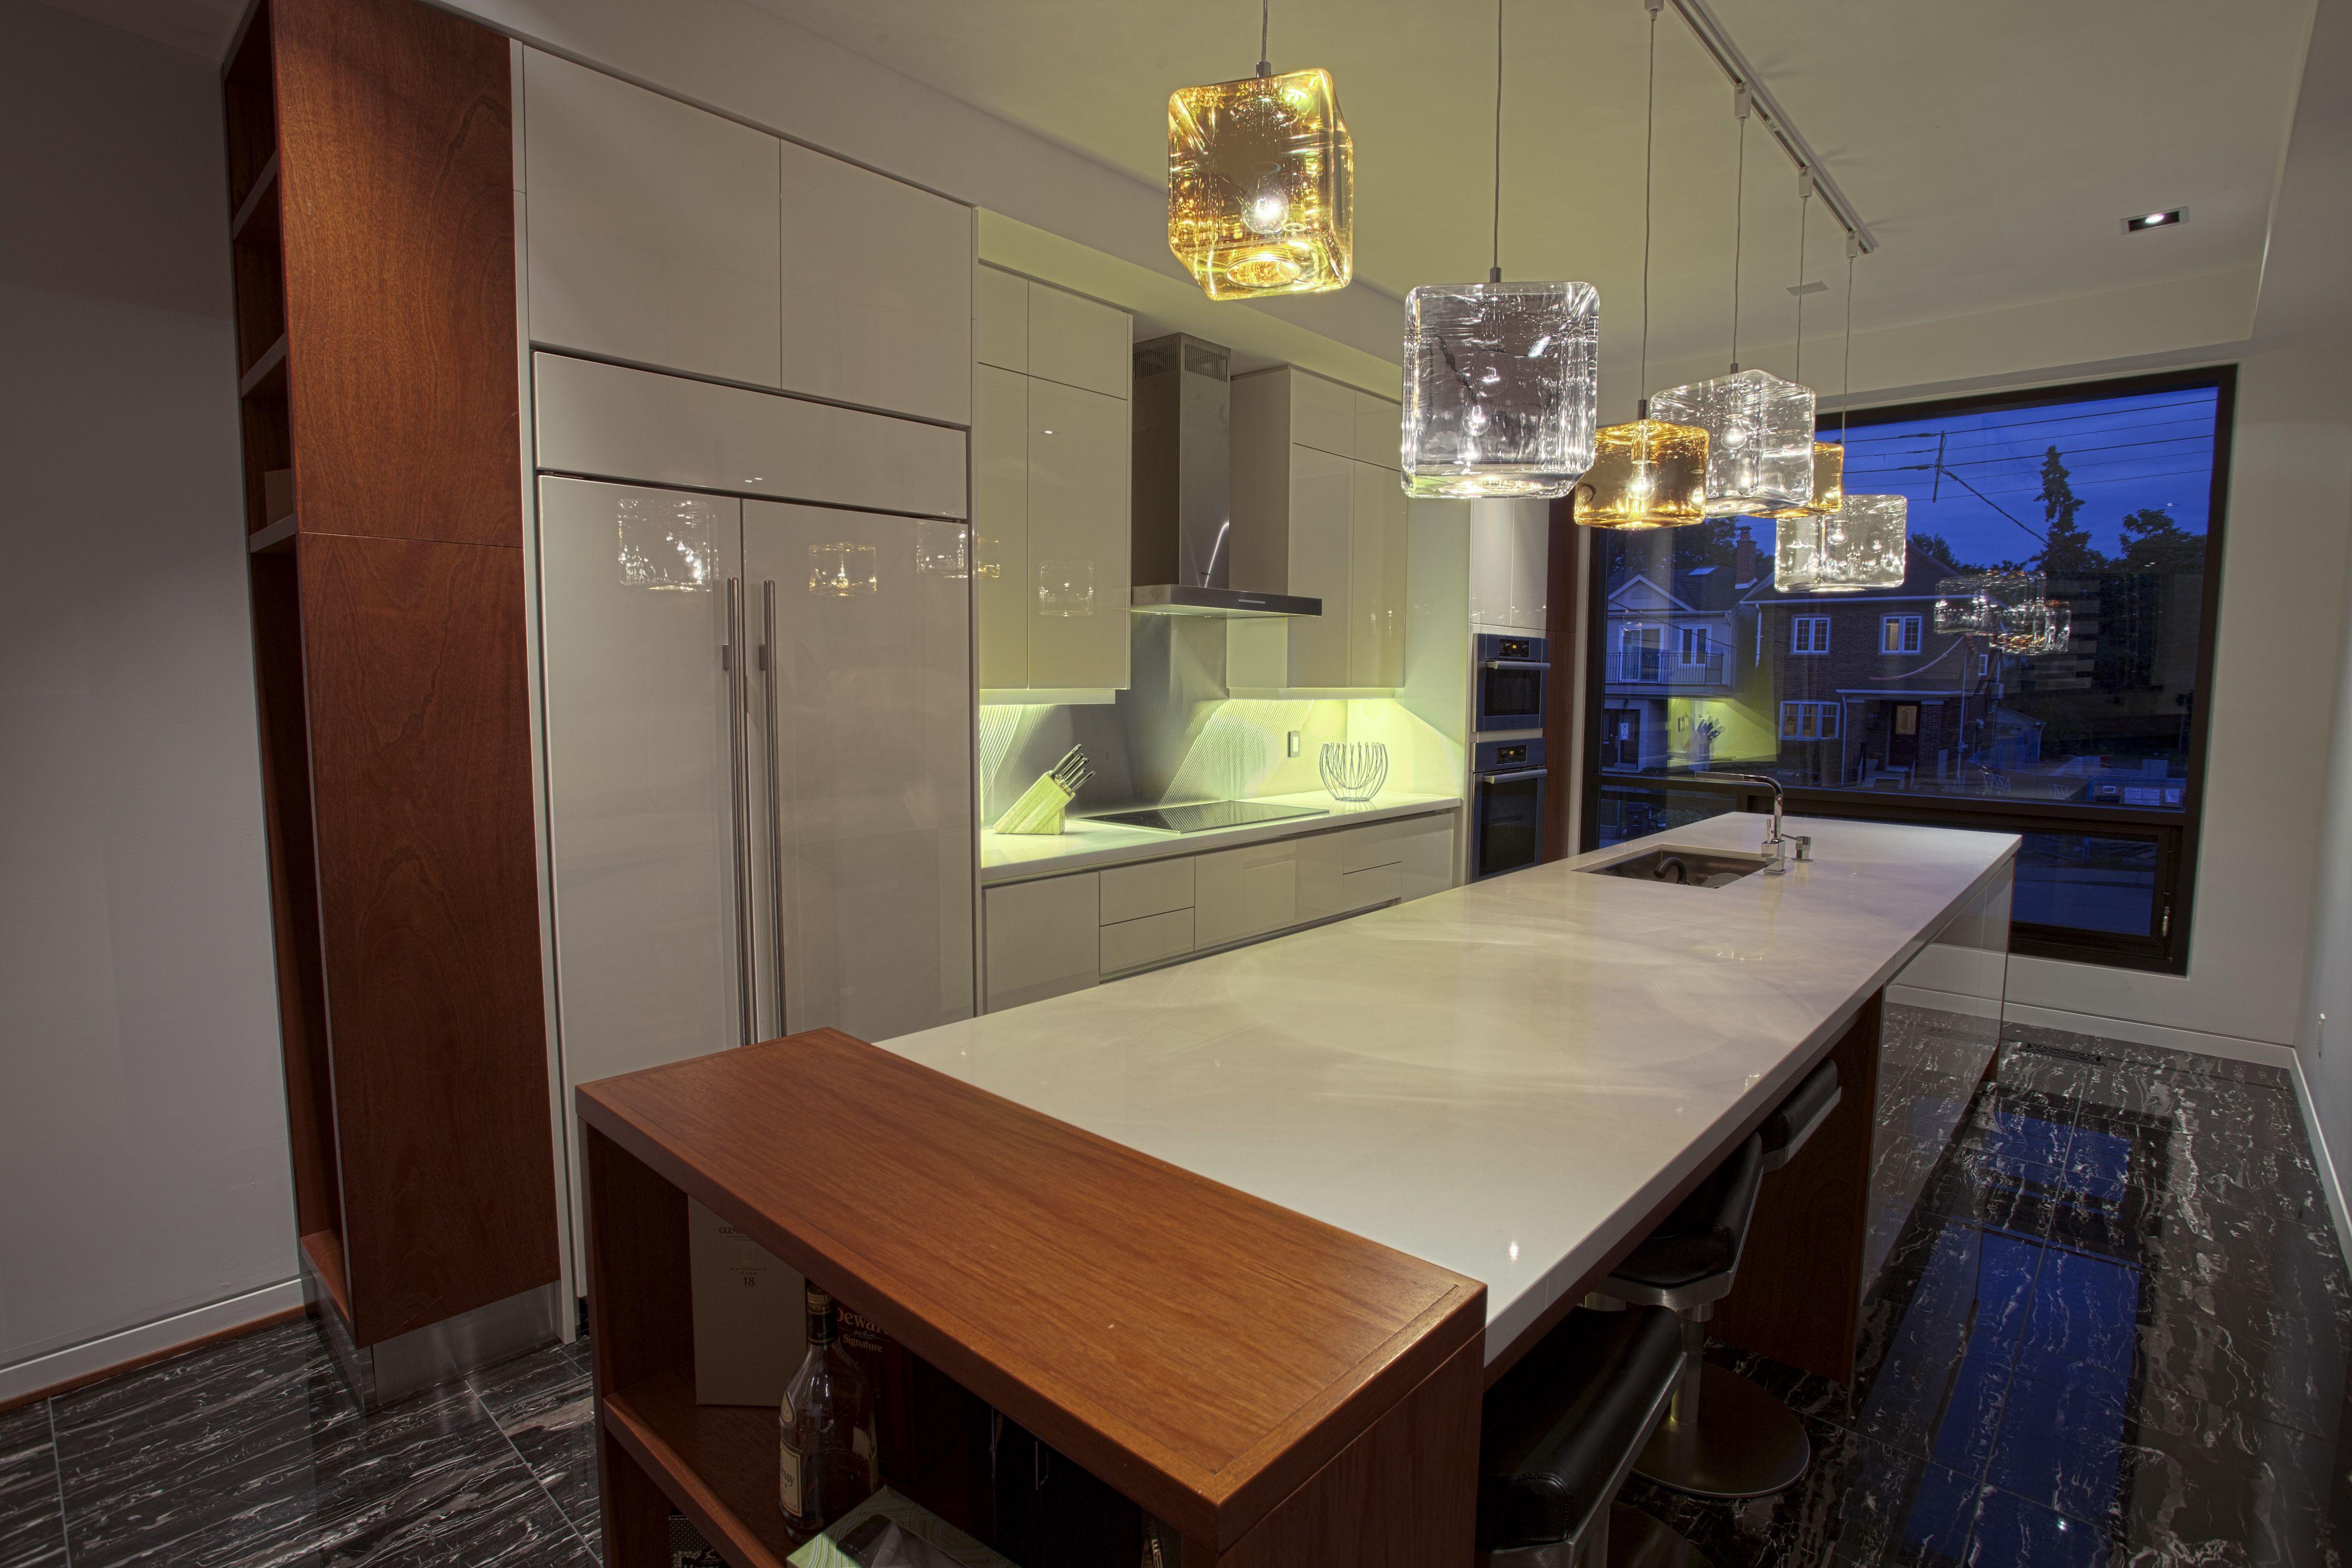 Modern Kitchen. Please visit www.oedesignbuild.com for more info.